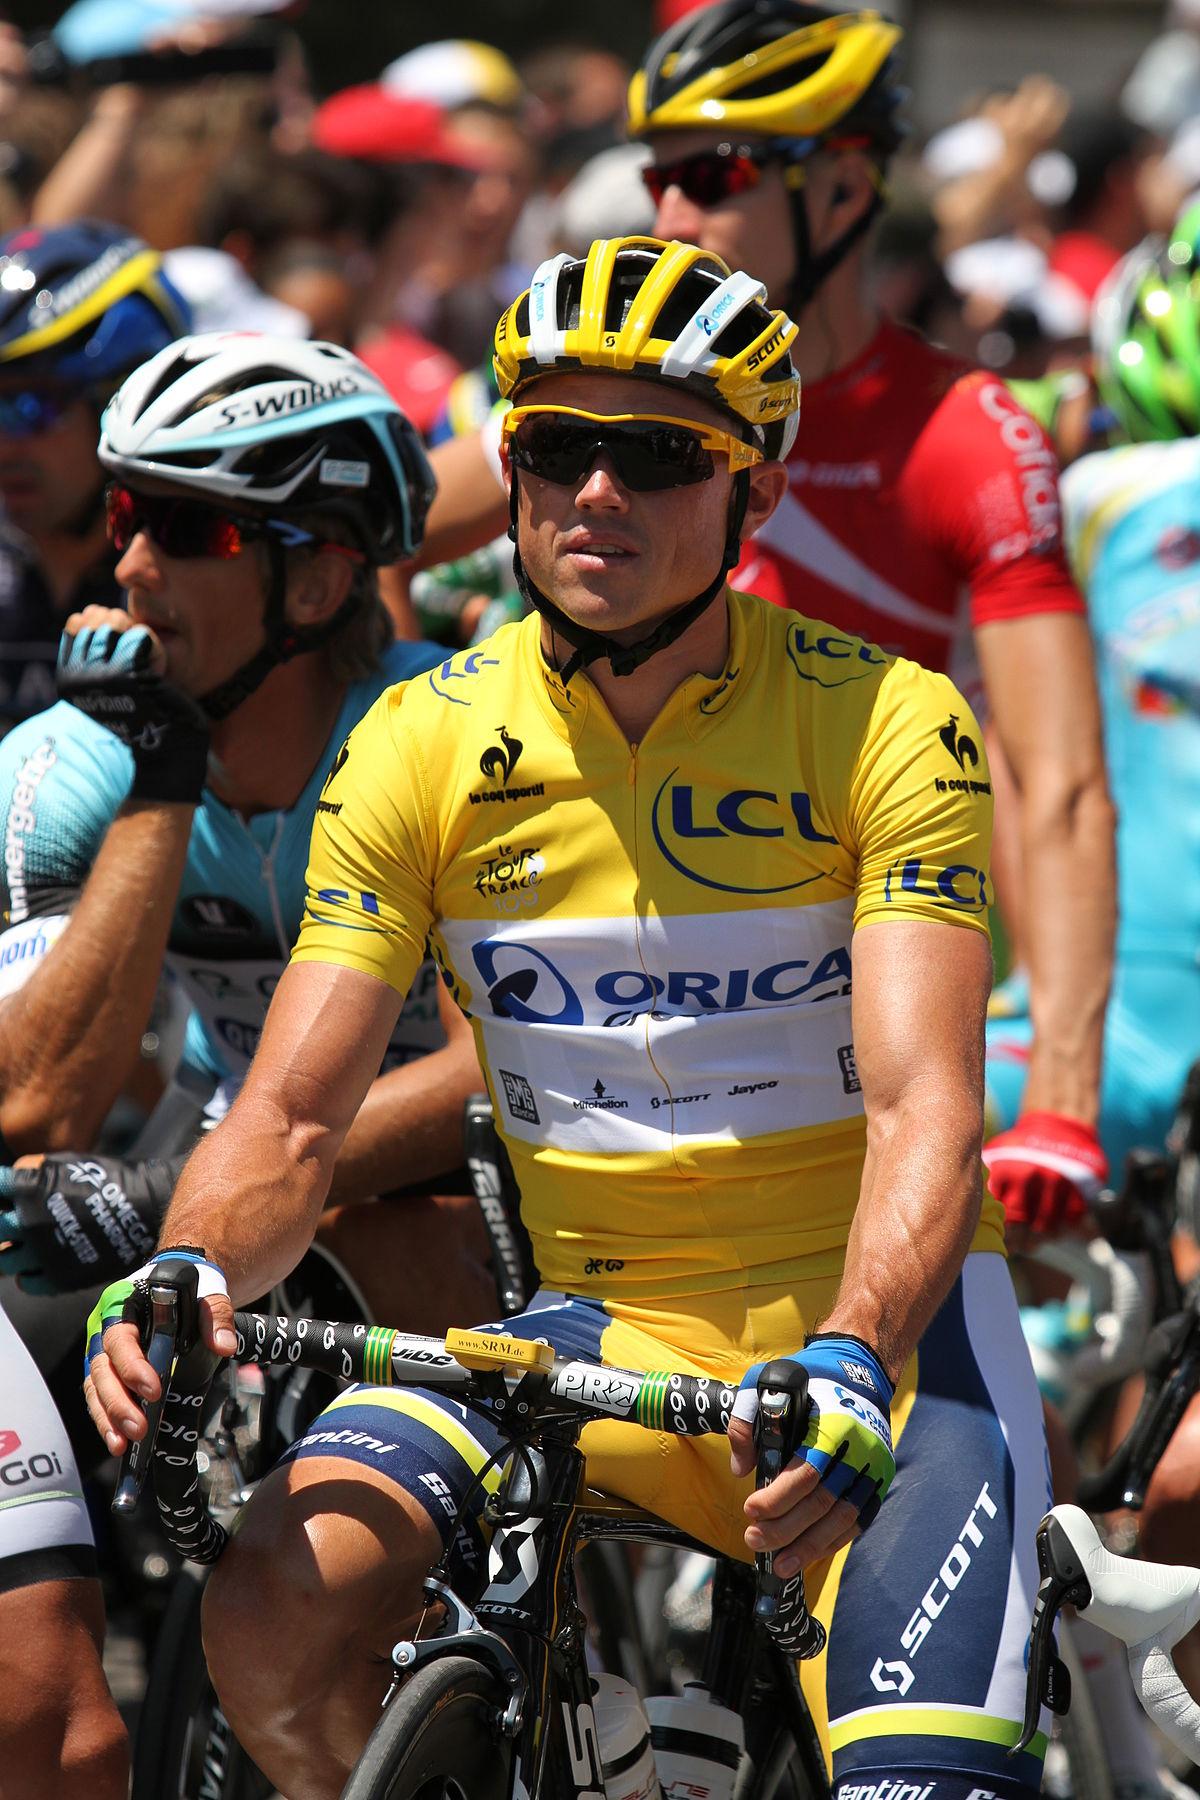 General classification in the Tour de France